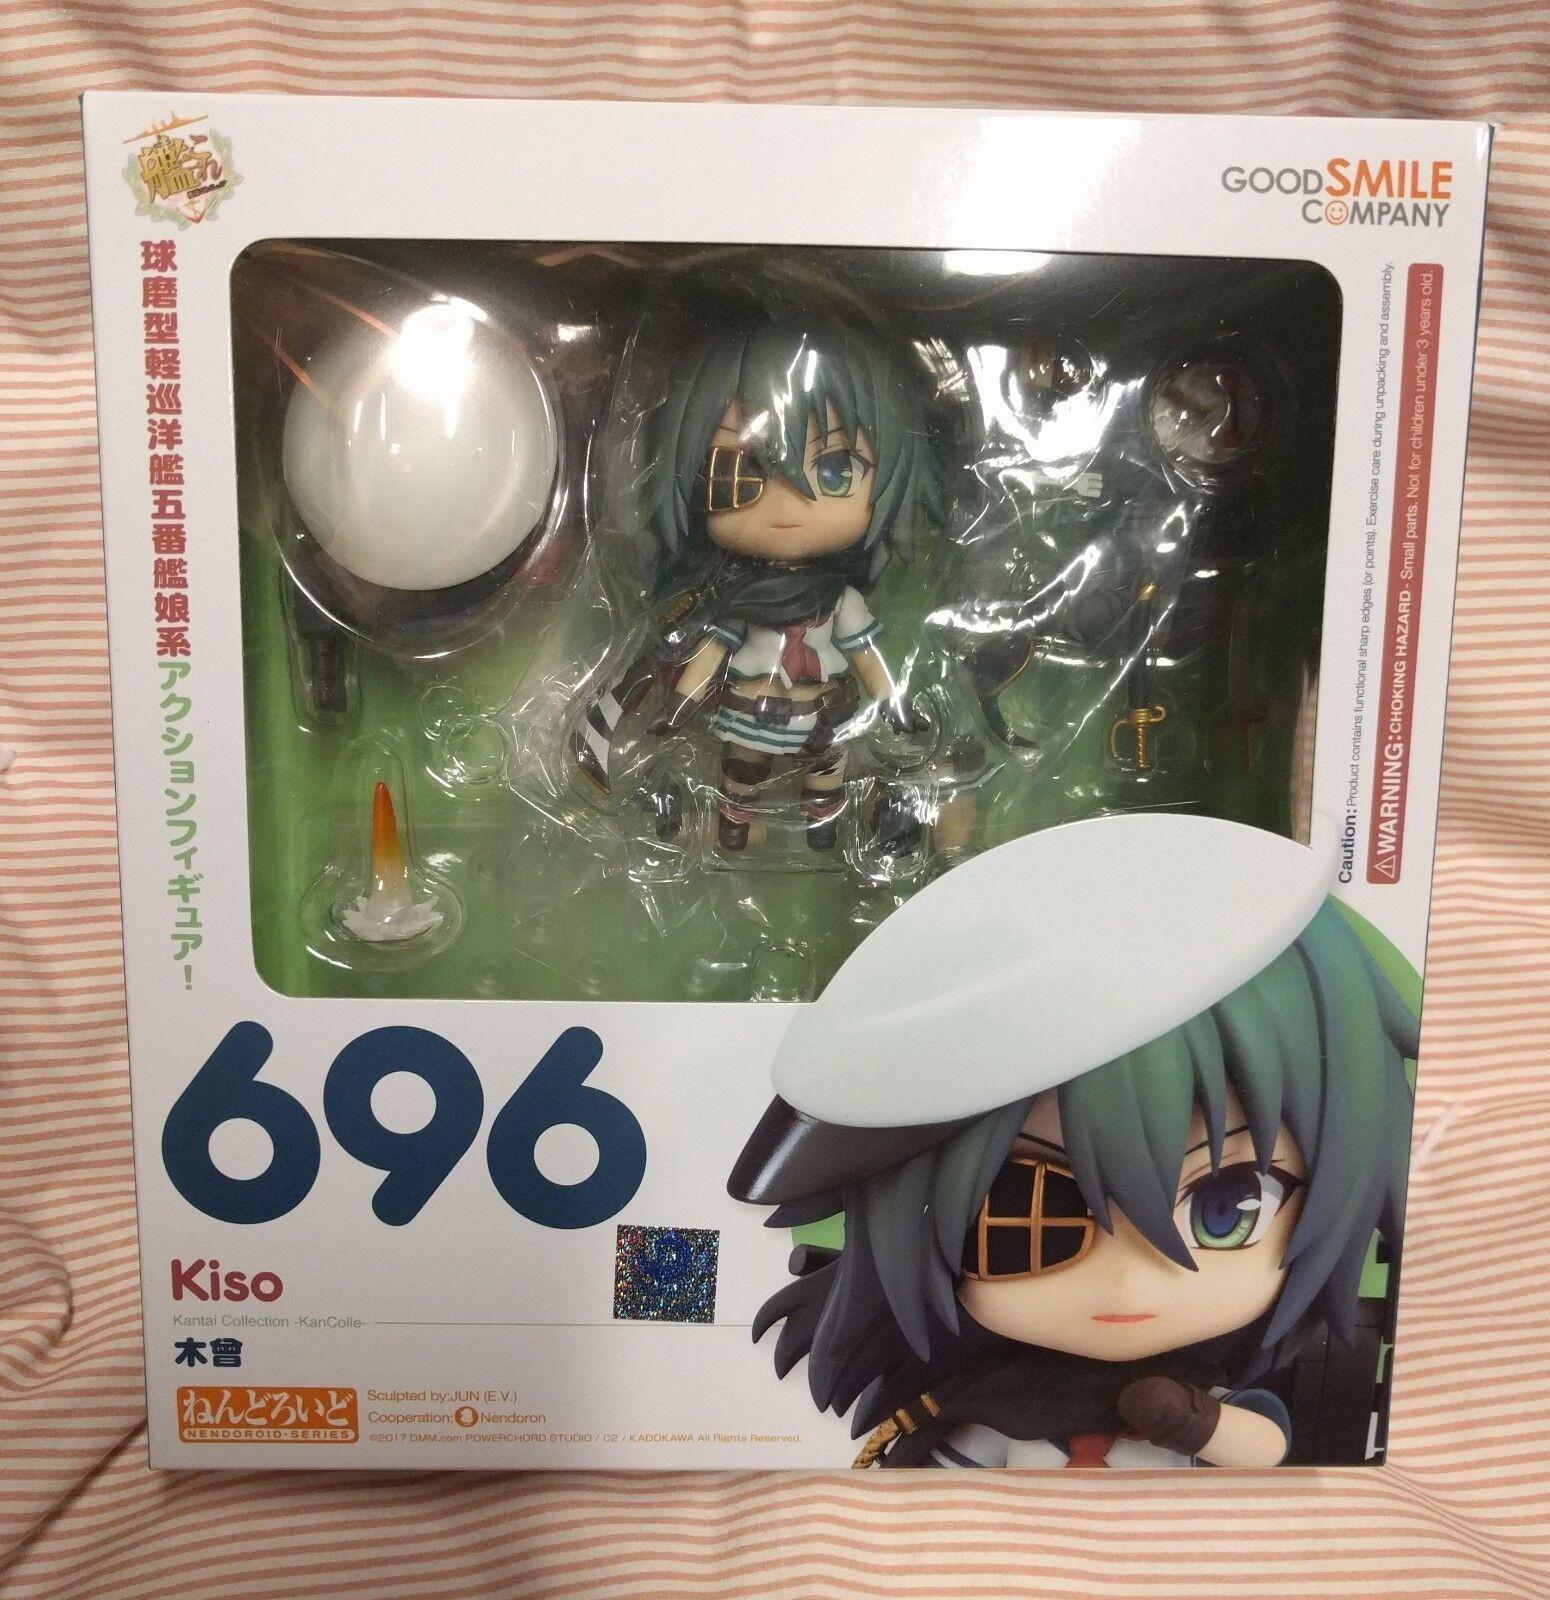 Nendoroid 696 Kantai Collection KISO Action Figure Good Smile Company F/S